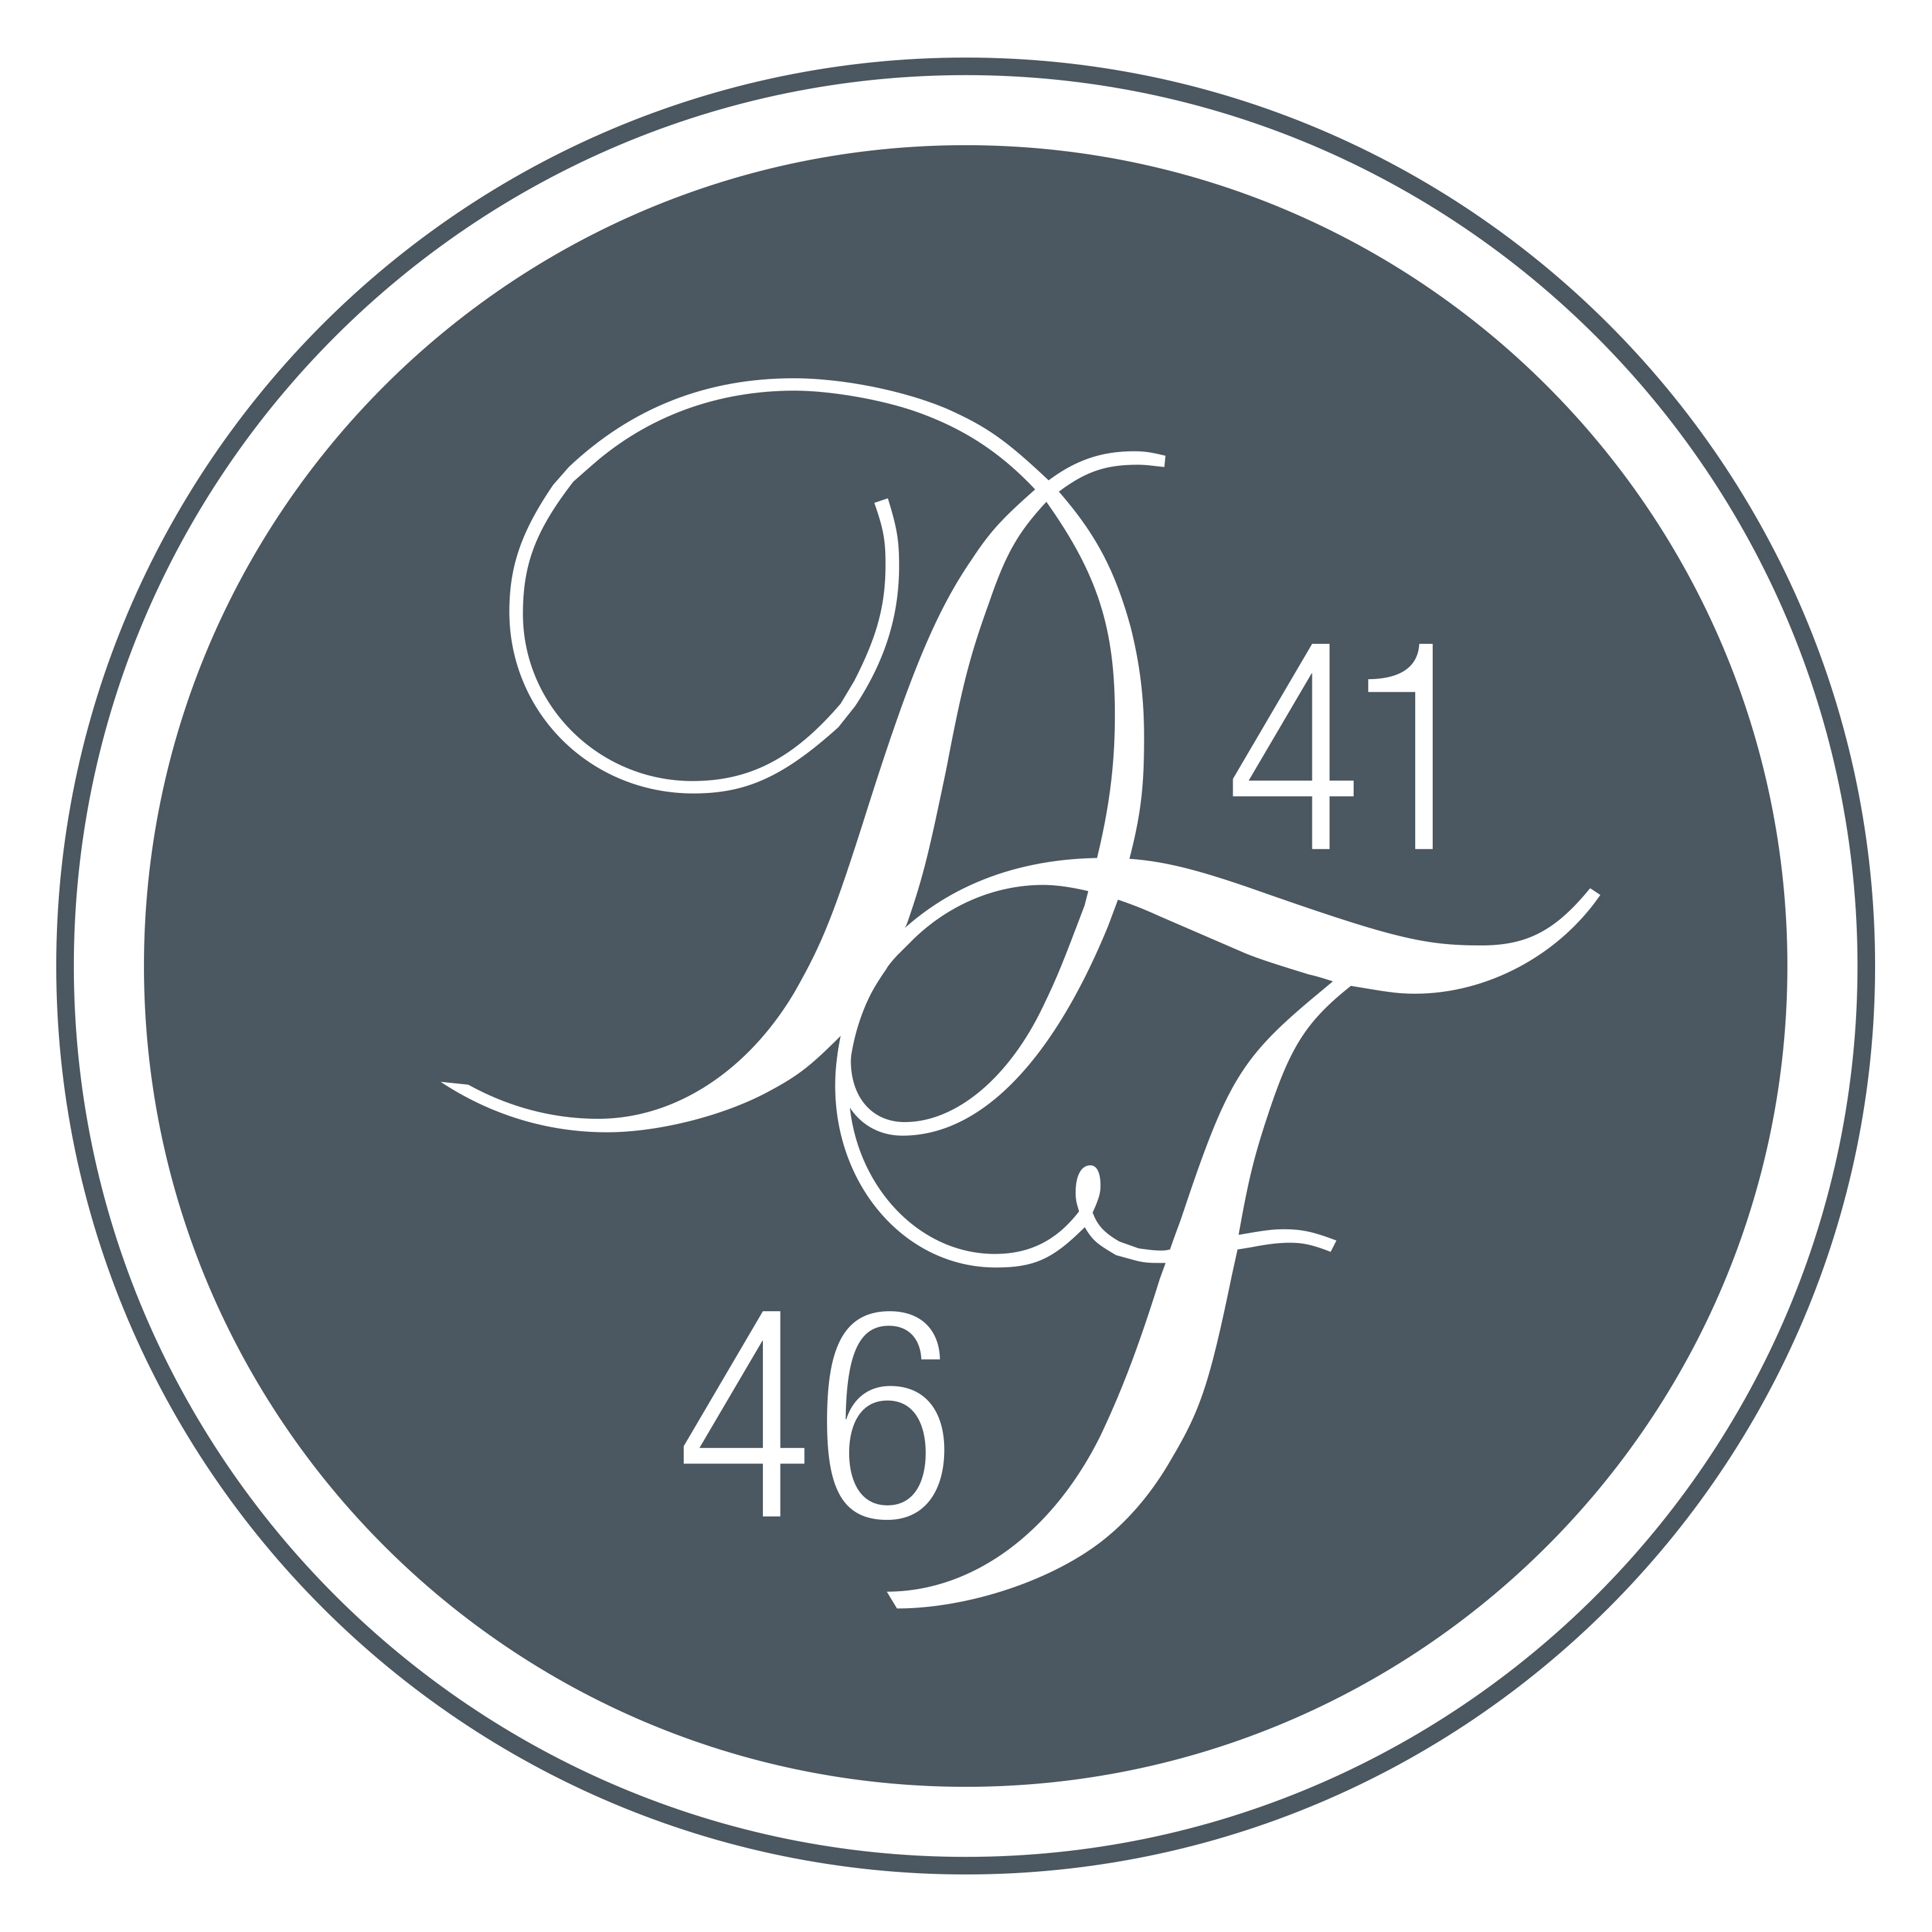 DF-4146